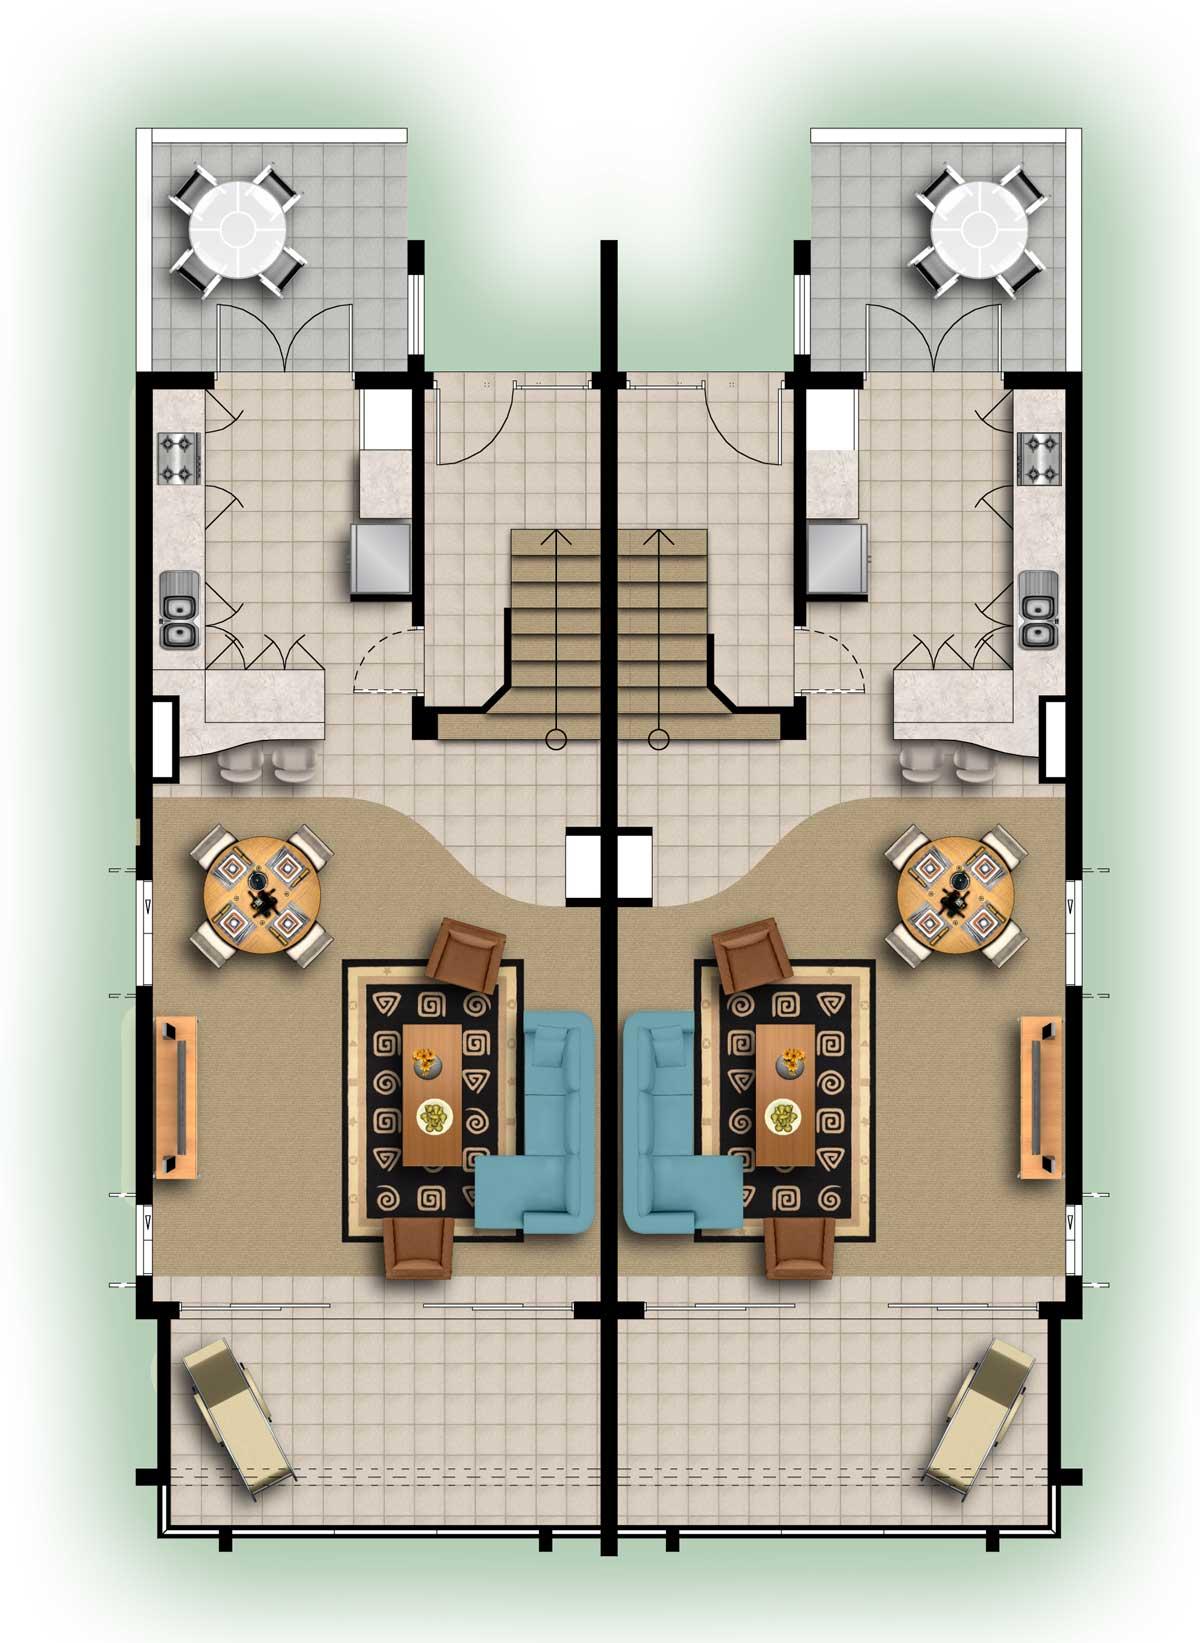 Kitchen Floor Plans Symbols